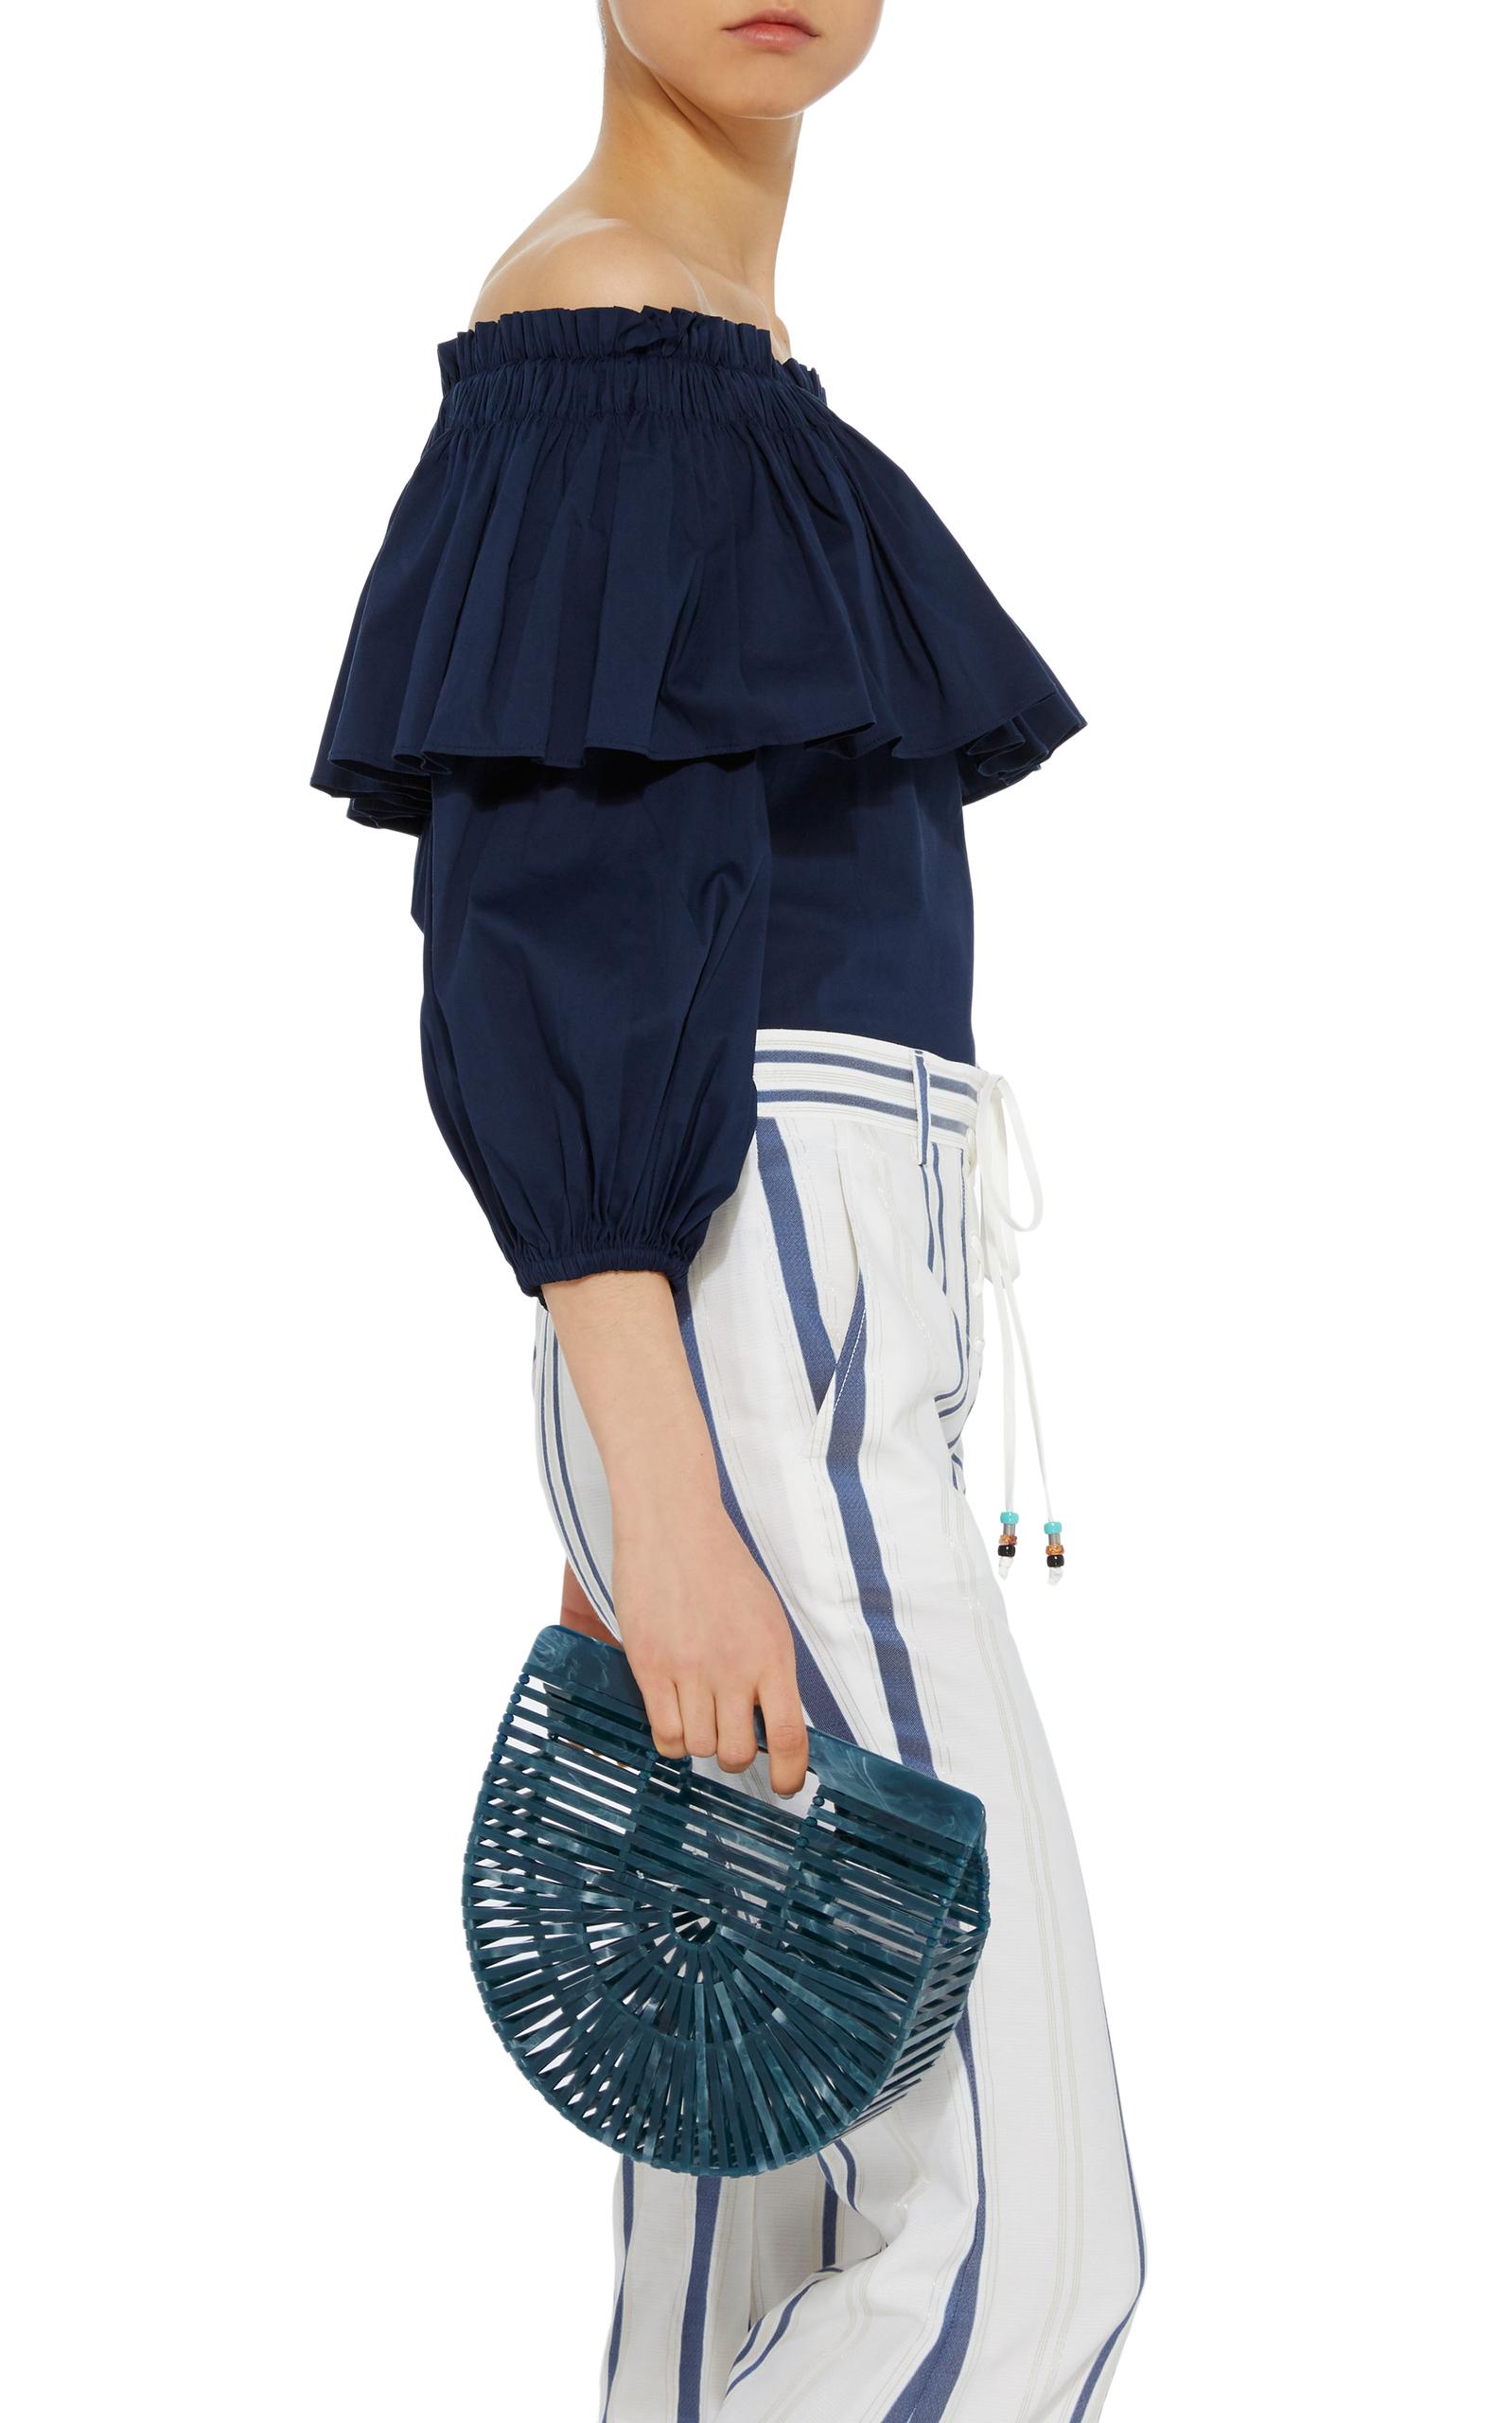 Mini Acrylic Ark Bag Cult Gaia oOCpwK